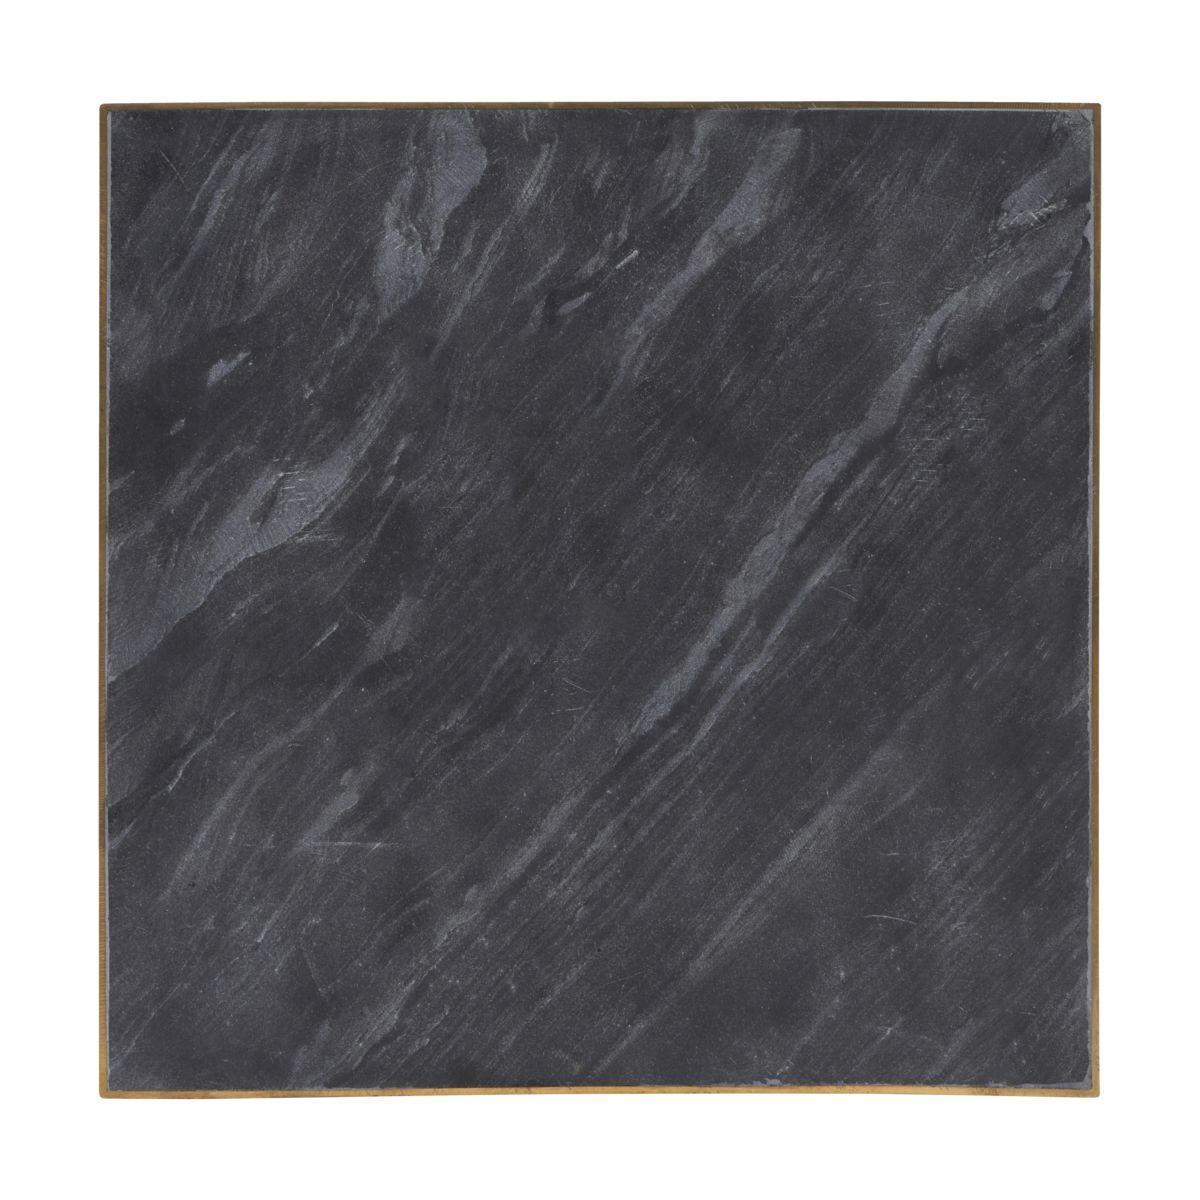 House Doctor Servírovací deska 30x30 cm, černá barva, zlatá barva, mramor